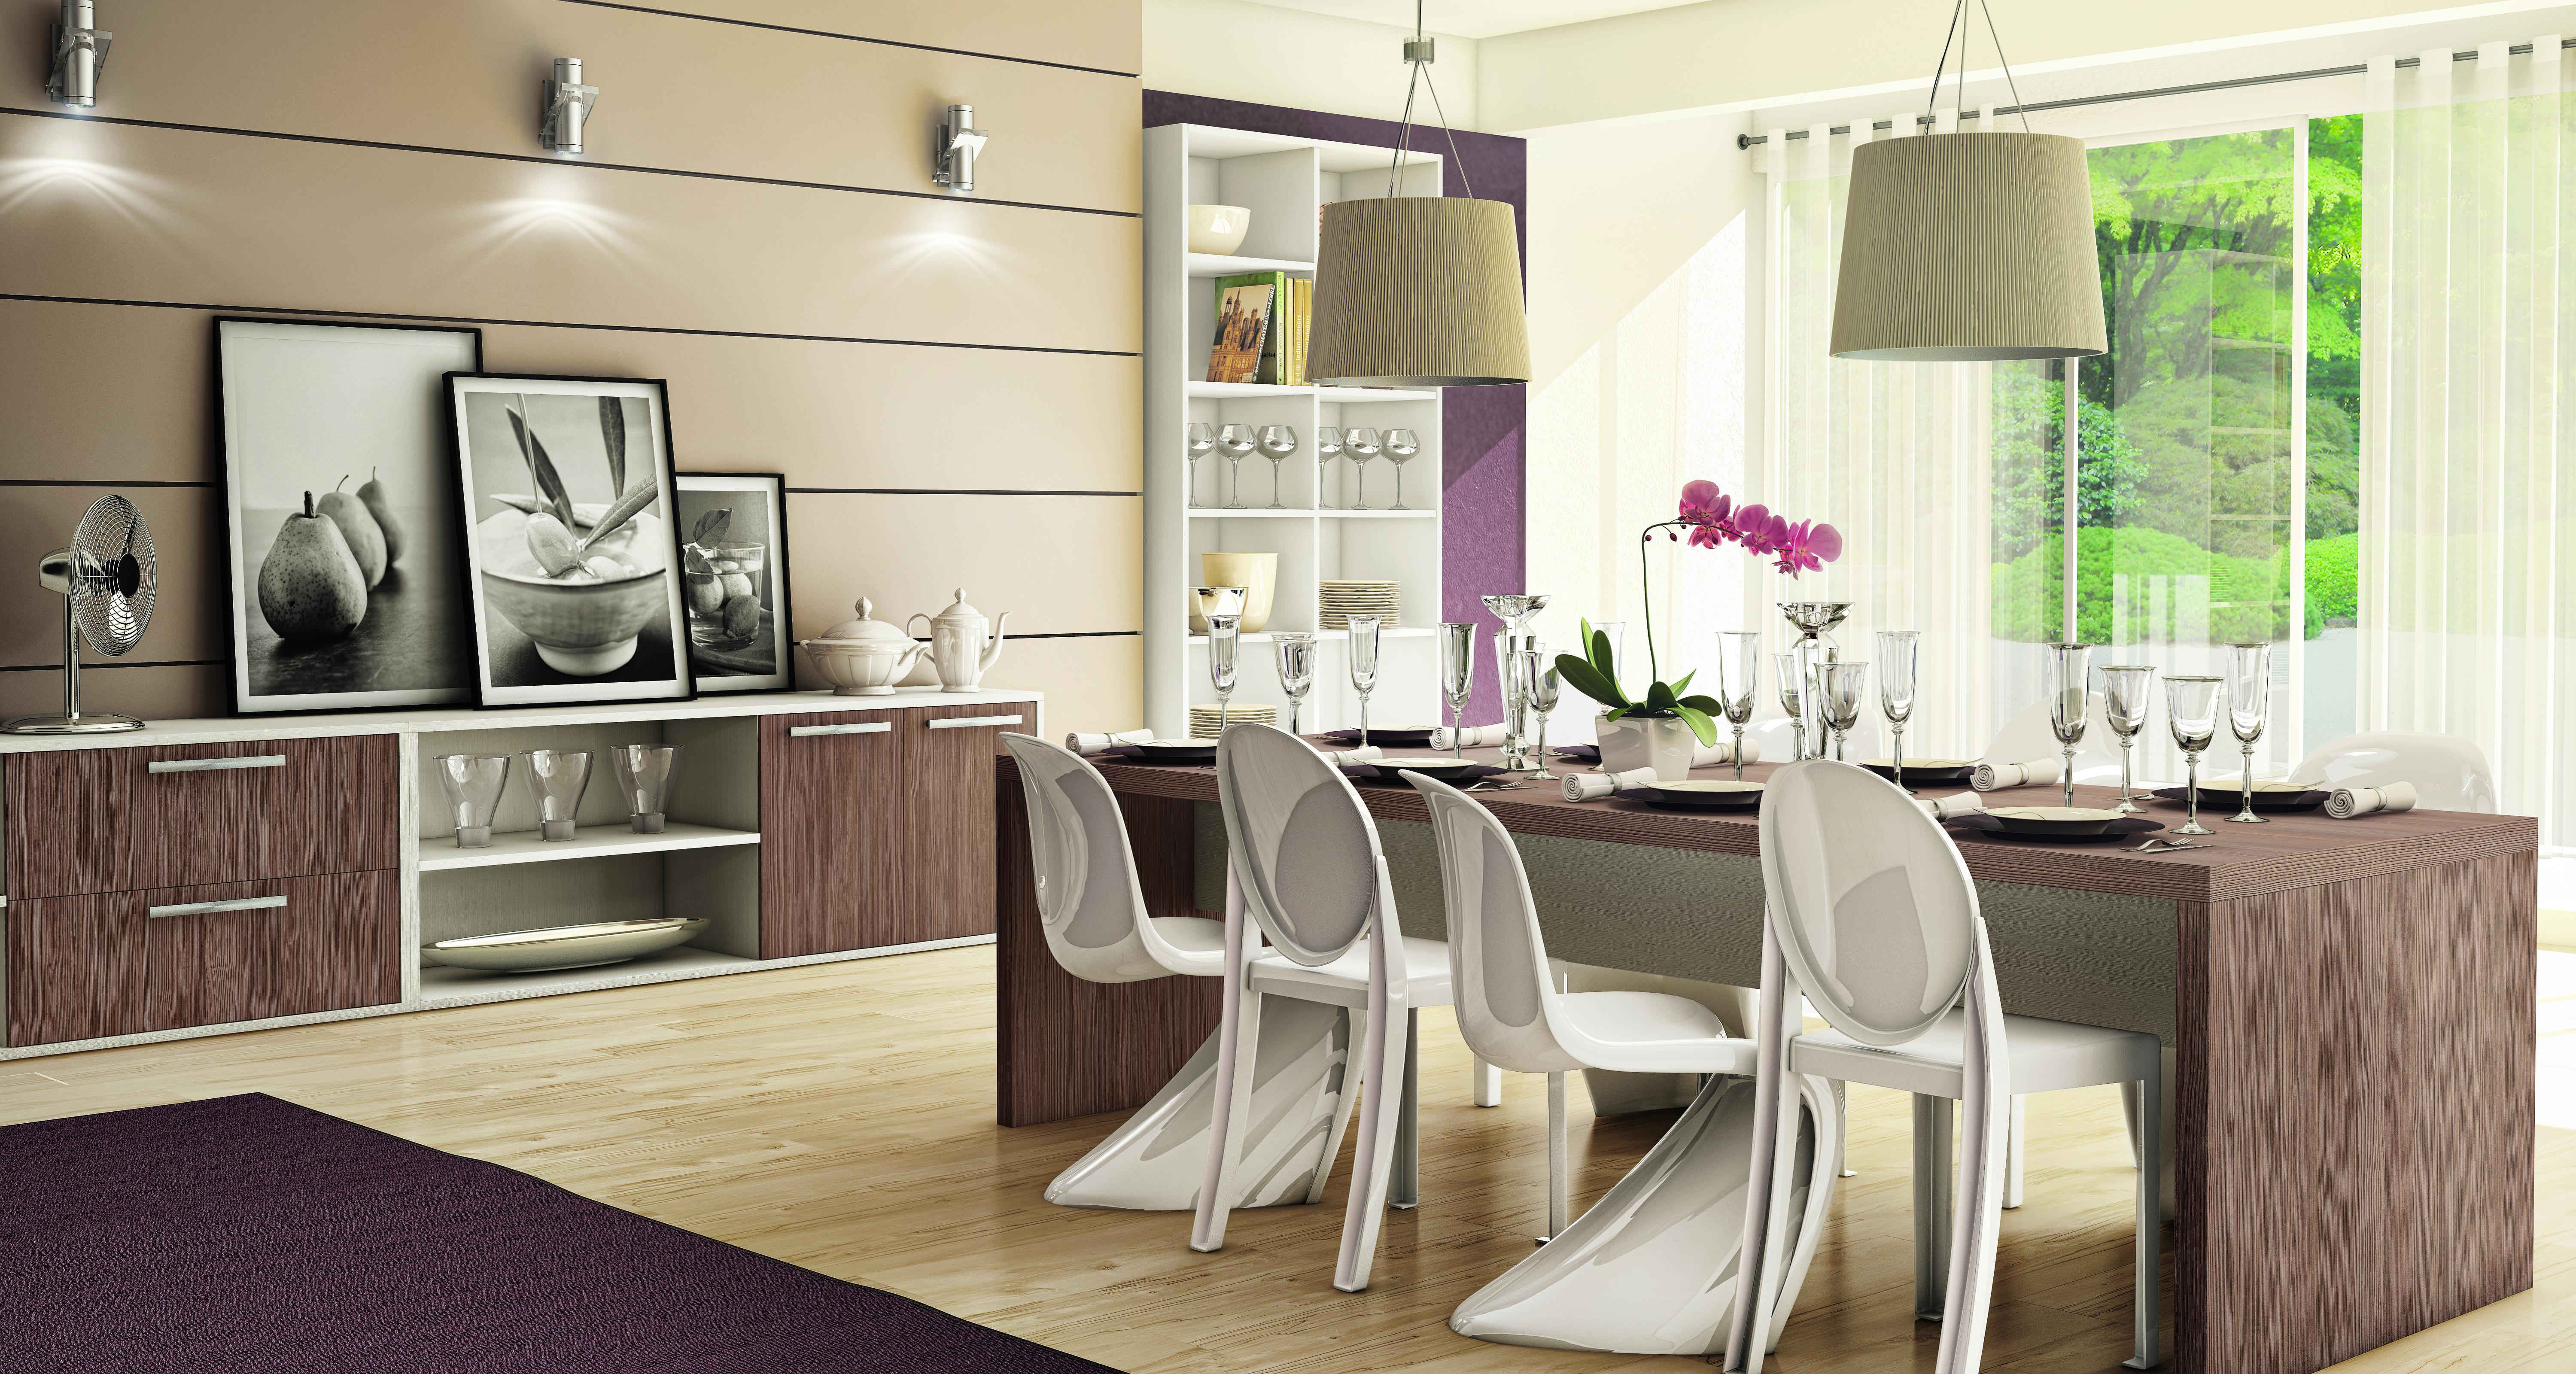 Sala De Jantar Moveis Hans ~ Móveis planejados para salas de jantar